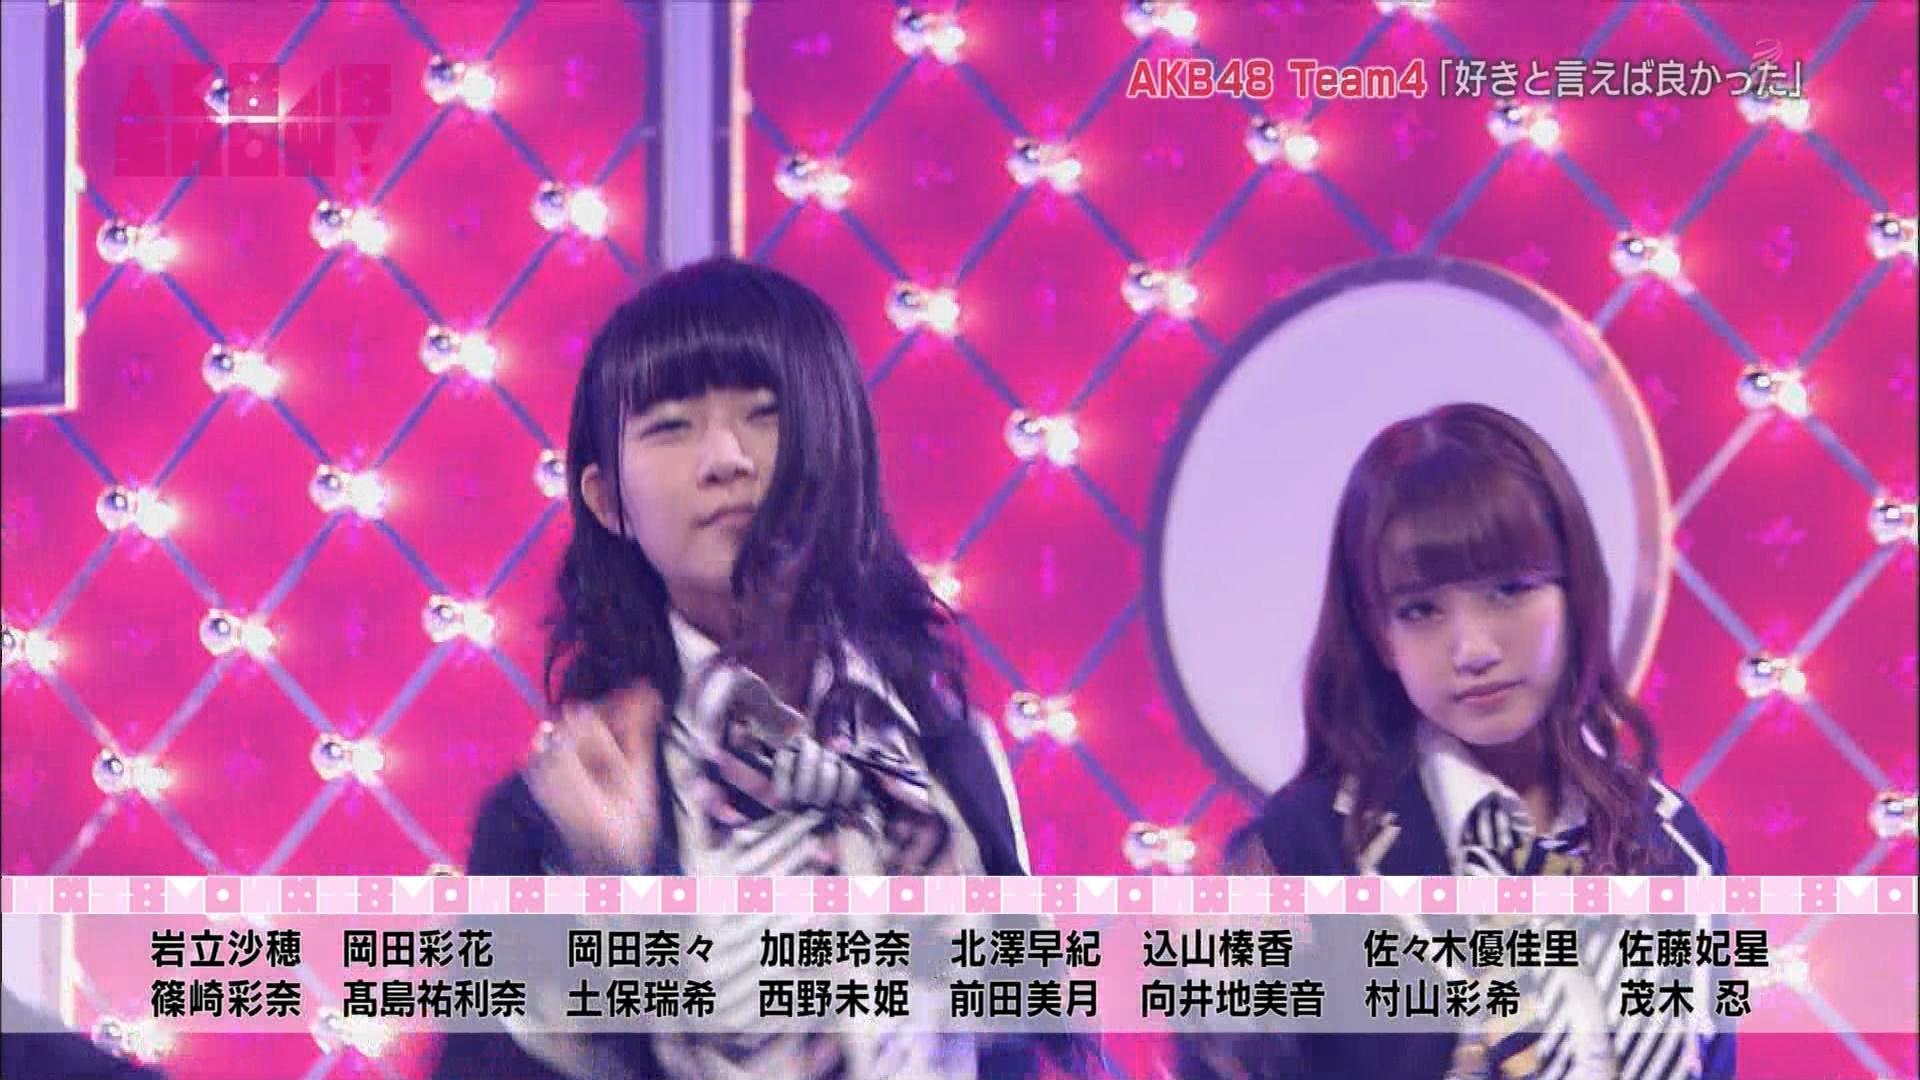 AKB48SHOW チーム4好きといえば良かった 加藤玲奈 20140830 (3)